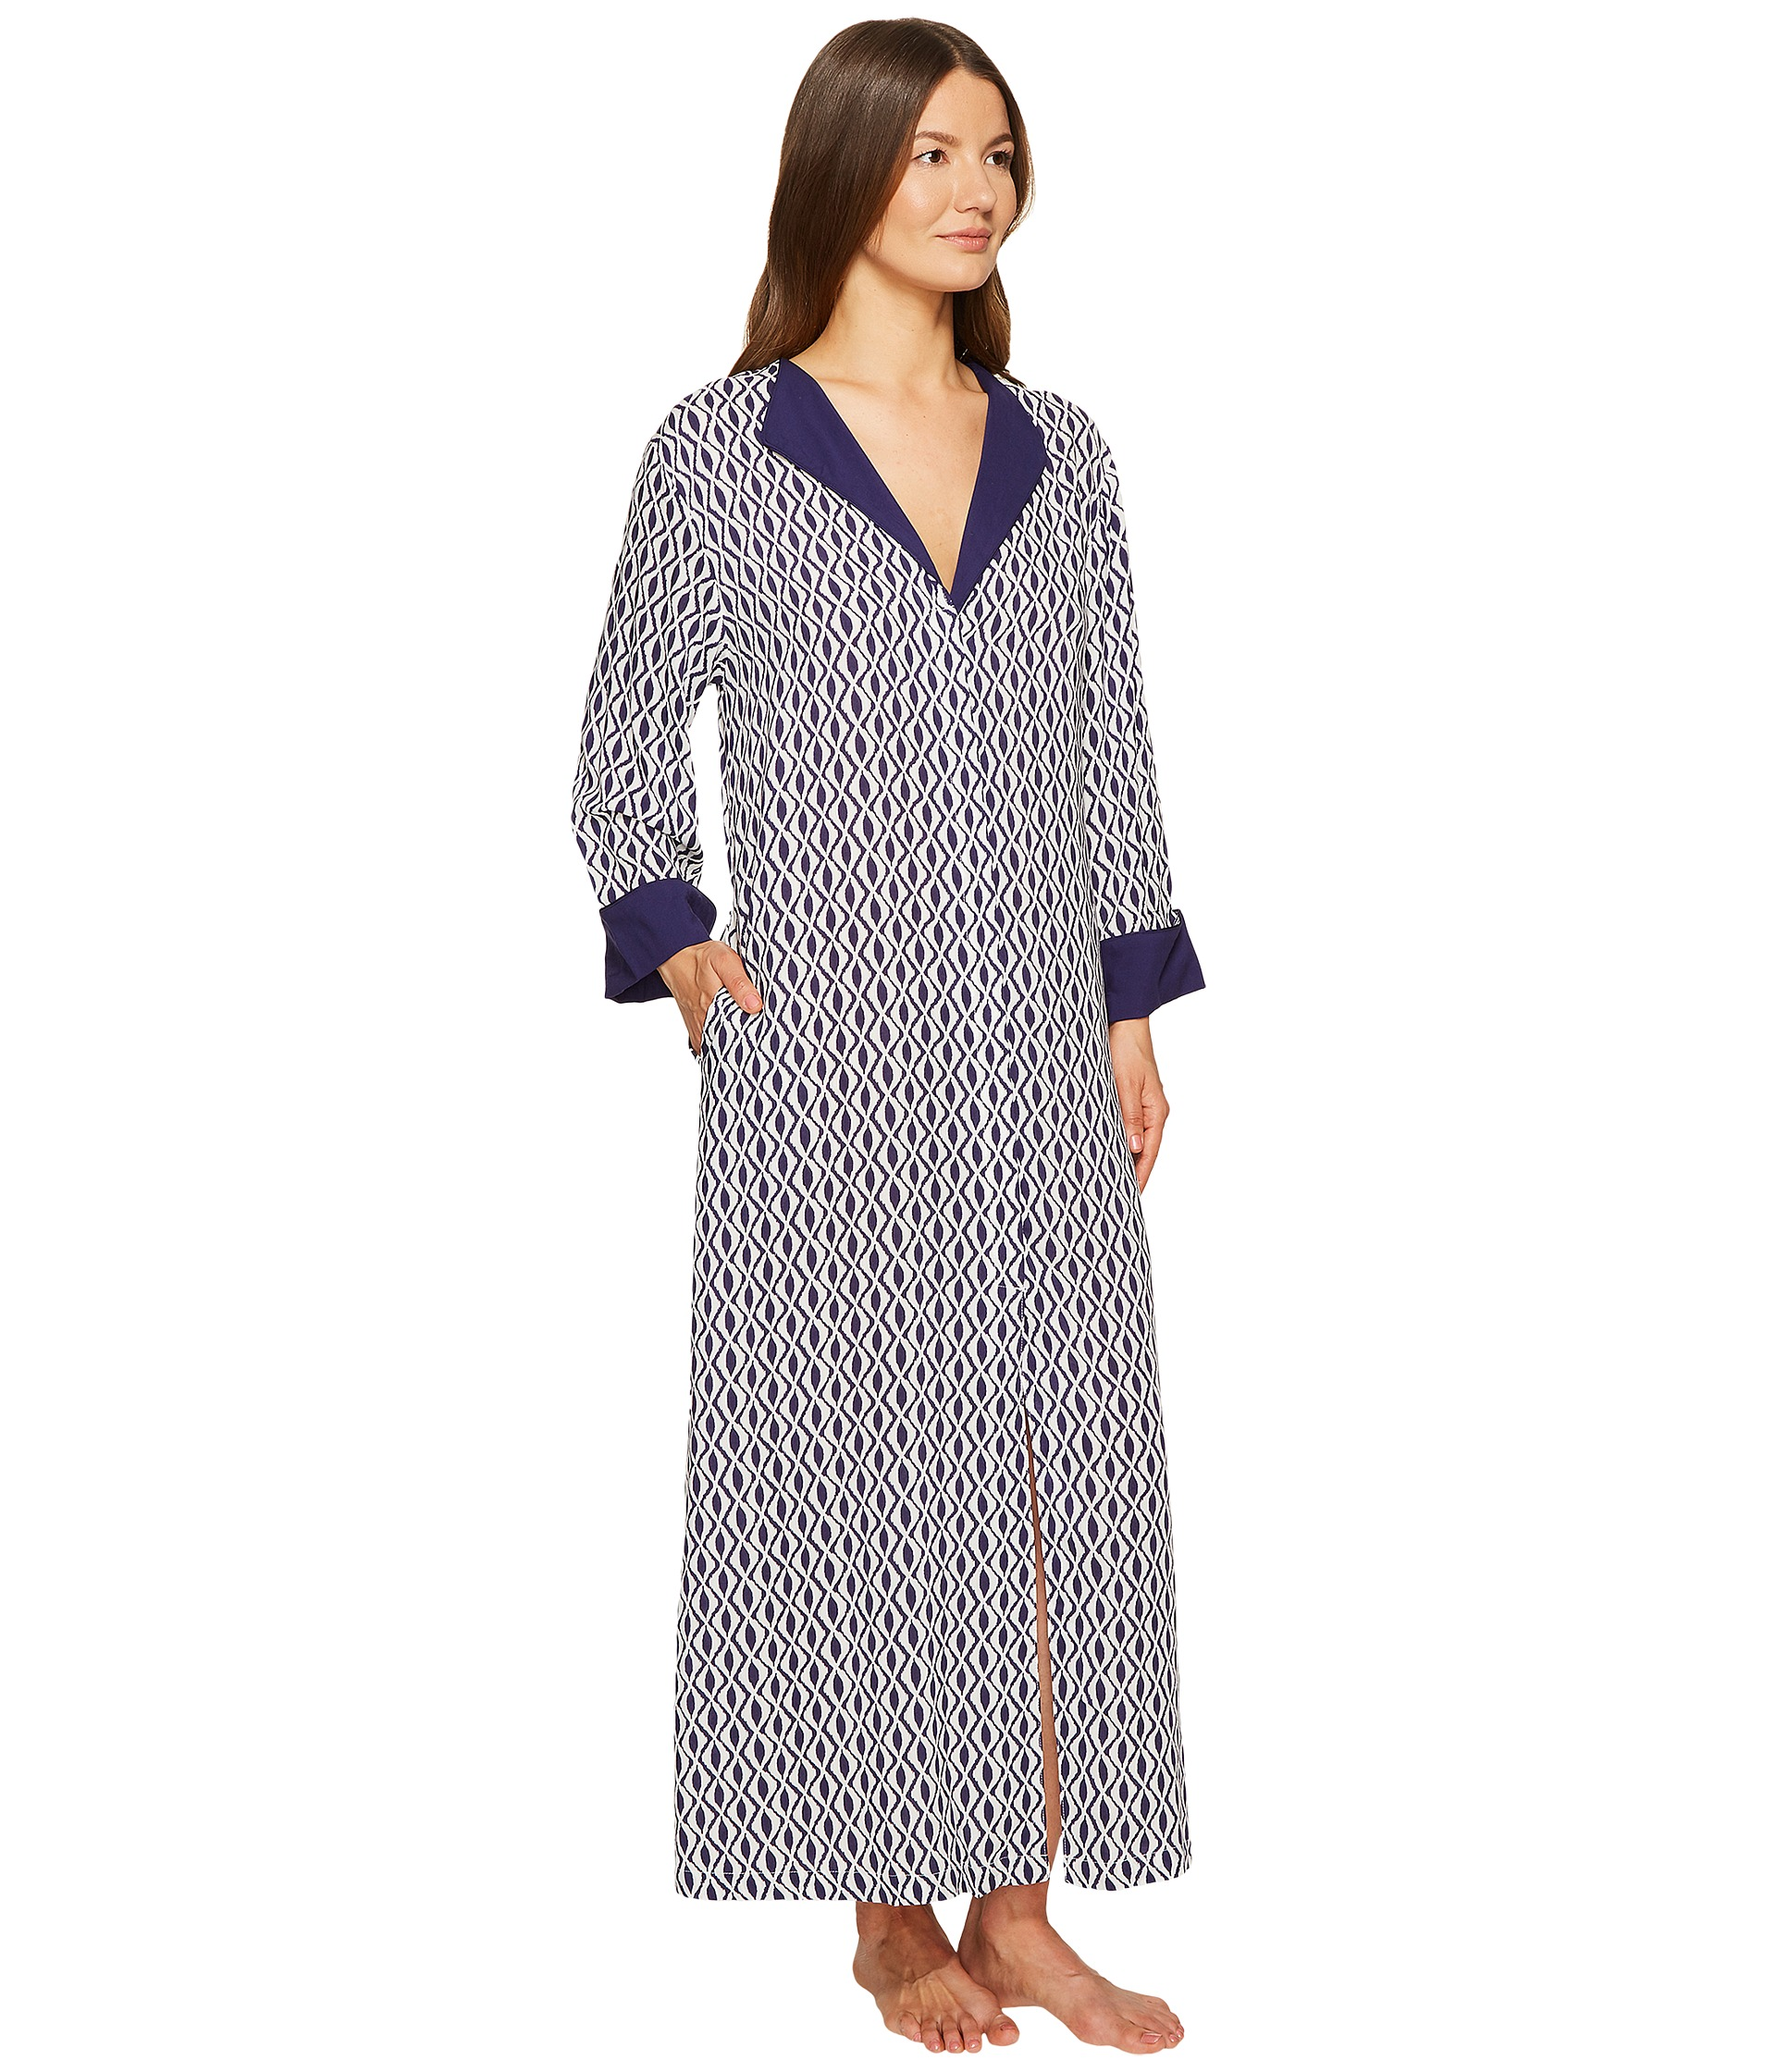 27063 together with Oscar De La Renta Pink Label Lace Trellis Long Robe moreover C3nsncpsb24qz2iqc2vjdxjlzgf0yspuzxr8dg95z3jvdhrvkm5ldhxtzxjjagfudg1hbmfnzxj8aw1hz2vzfhvwbg9hzhn8d2vkzgluzybsb25nigdvd24gcmvkide4ndrfmspkuec c3nsncpsb24qz2iqc2vjdxjlzgf0yspuzxr8dg95z3jvdhrvkm5ldhxtzxjjagfudg1hbmfnzxj8chjvzhvjdf9pbmzvknboch5wcm9kdwn0c19pzd0ymjmz as well 6cc976e6ecb64de88e7b54a1e8c4aa61 also 4. on oscar de la renta pink label sleepwear